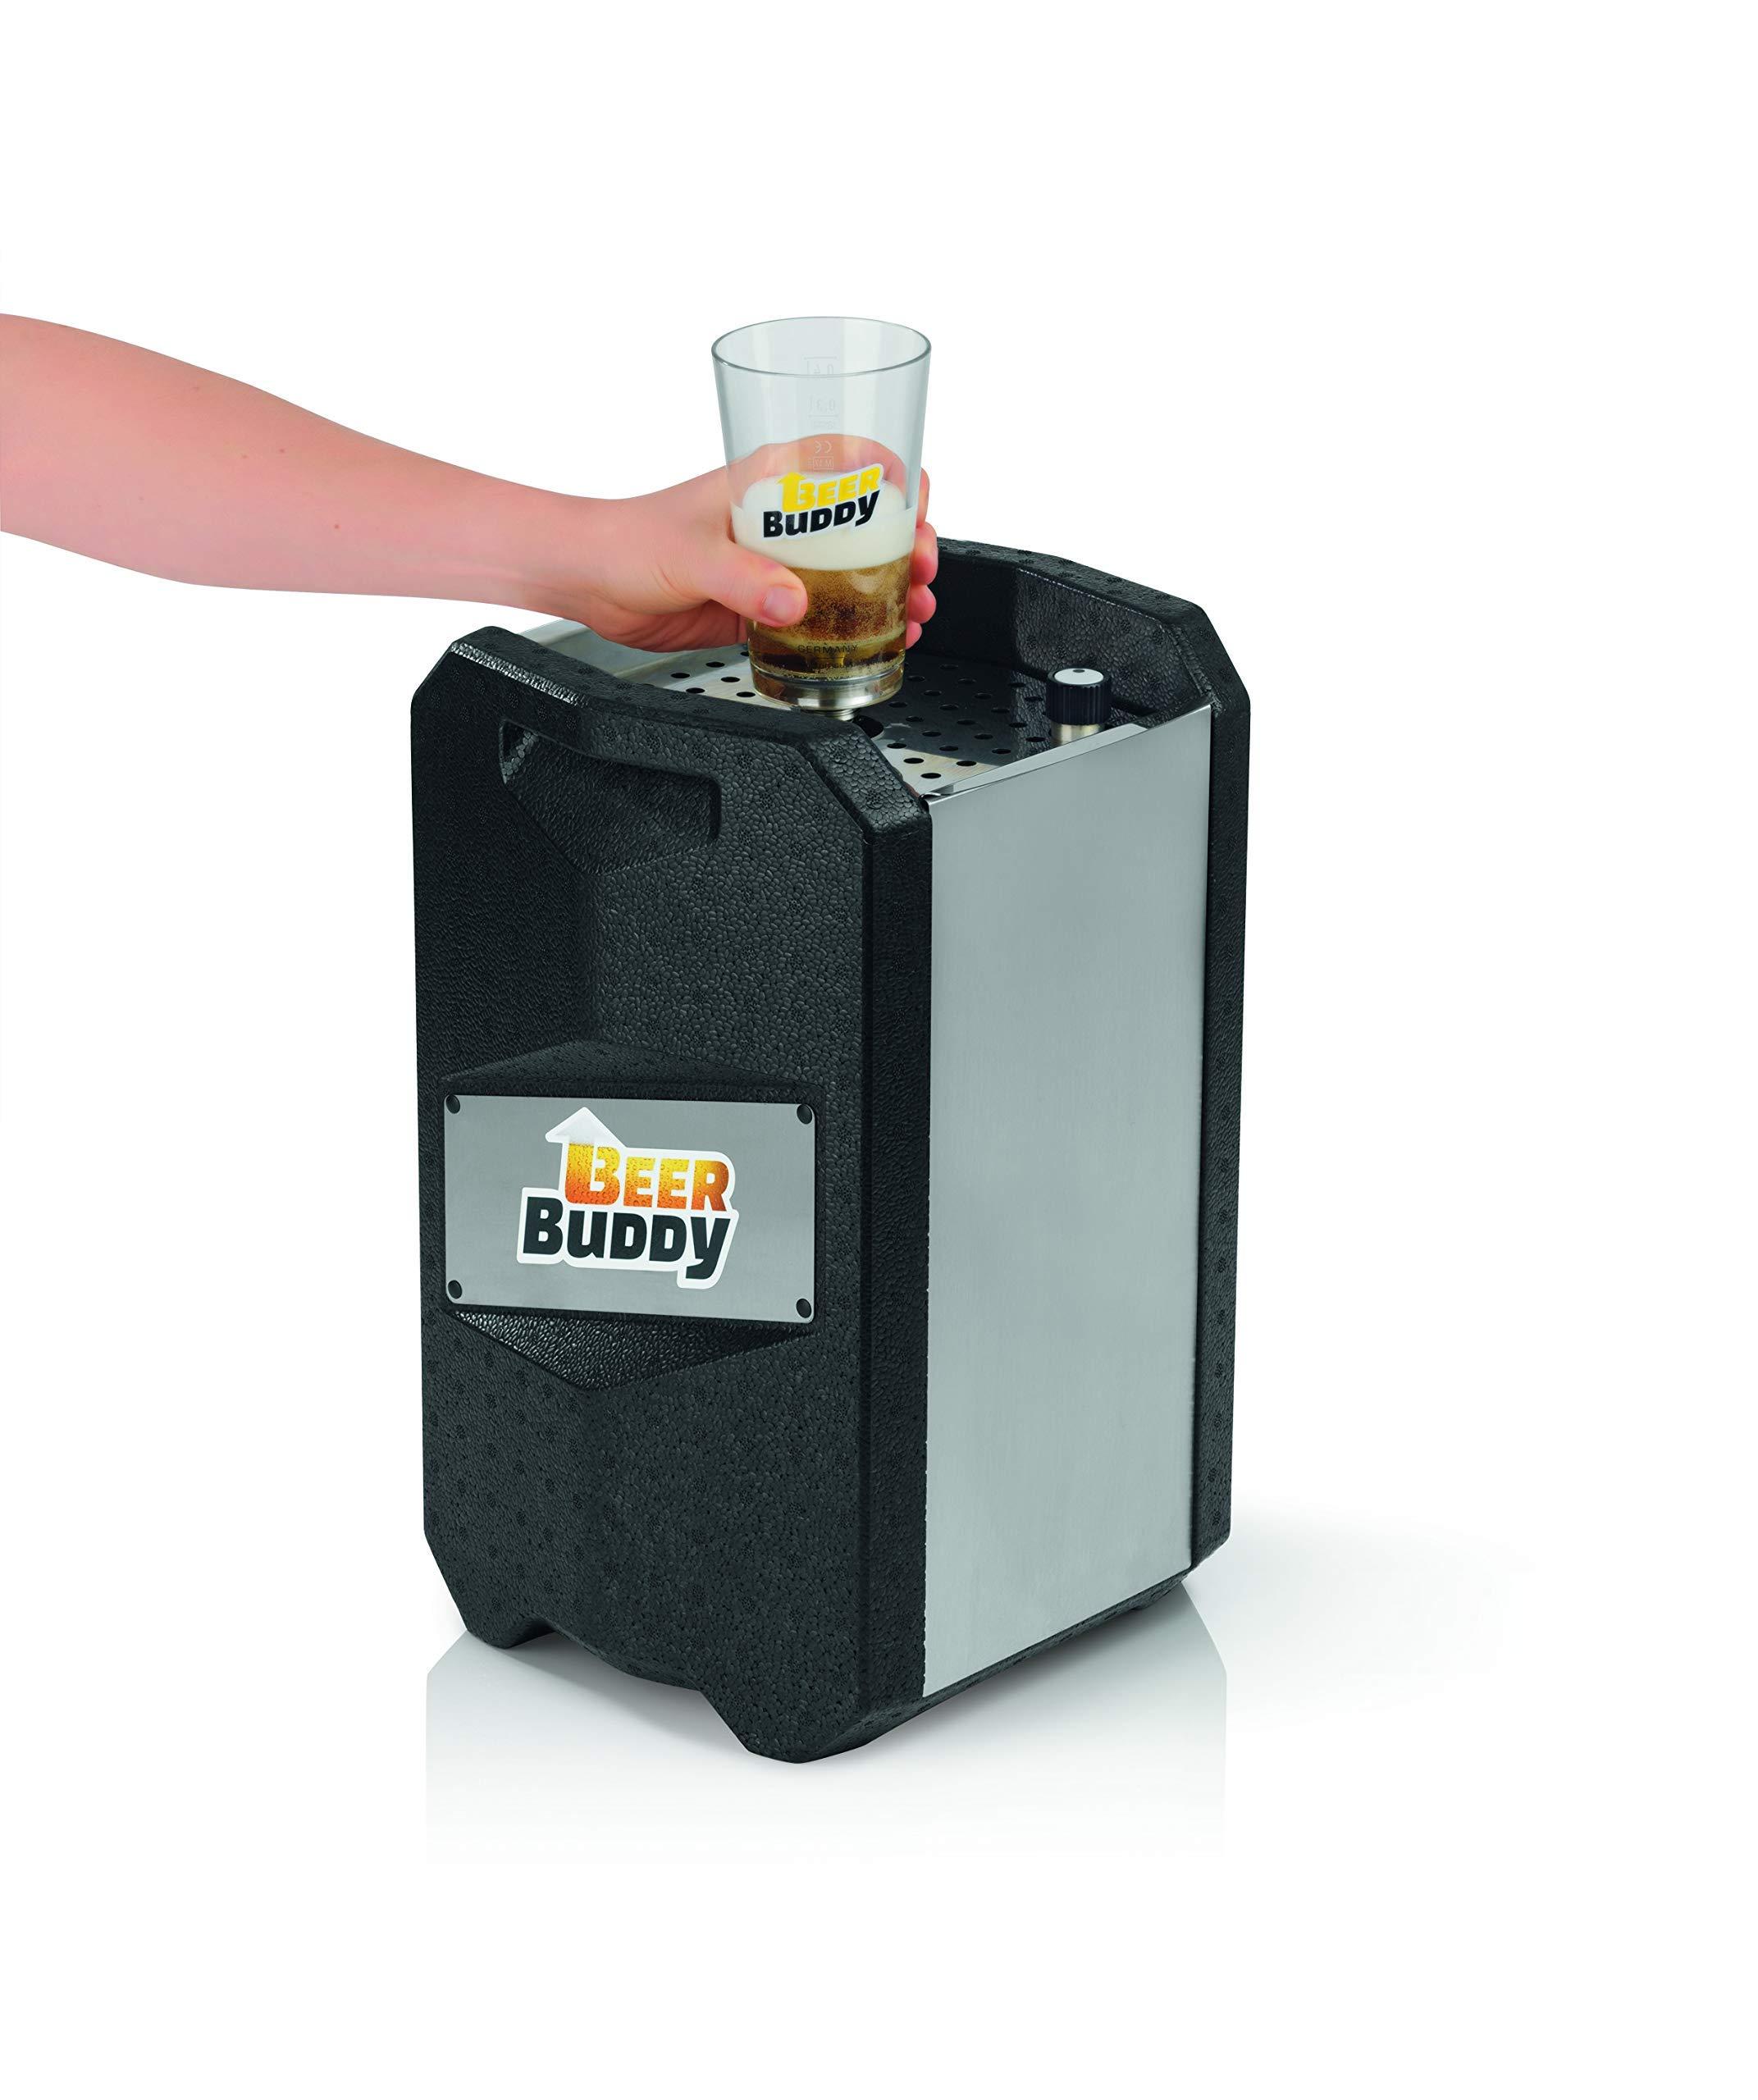 81EWbg%2BNy4L - Beer Buddy Version 2.0 latest version. Bottoms Up Beer Tap for 5 Litre Party Barrels